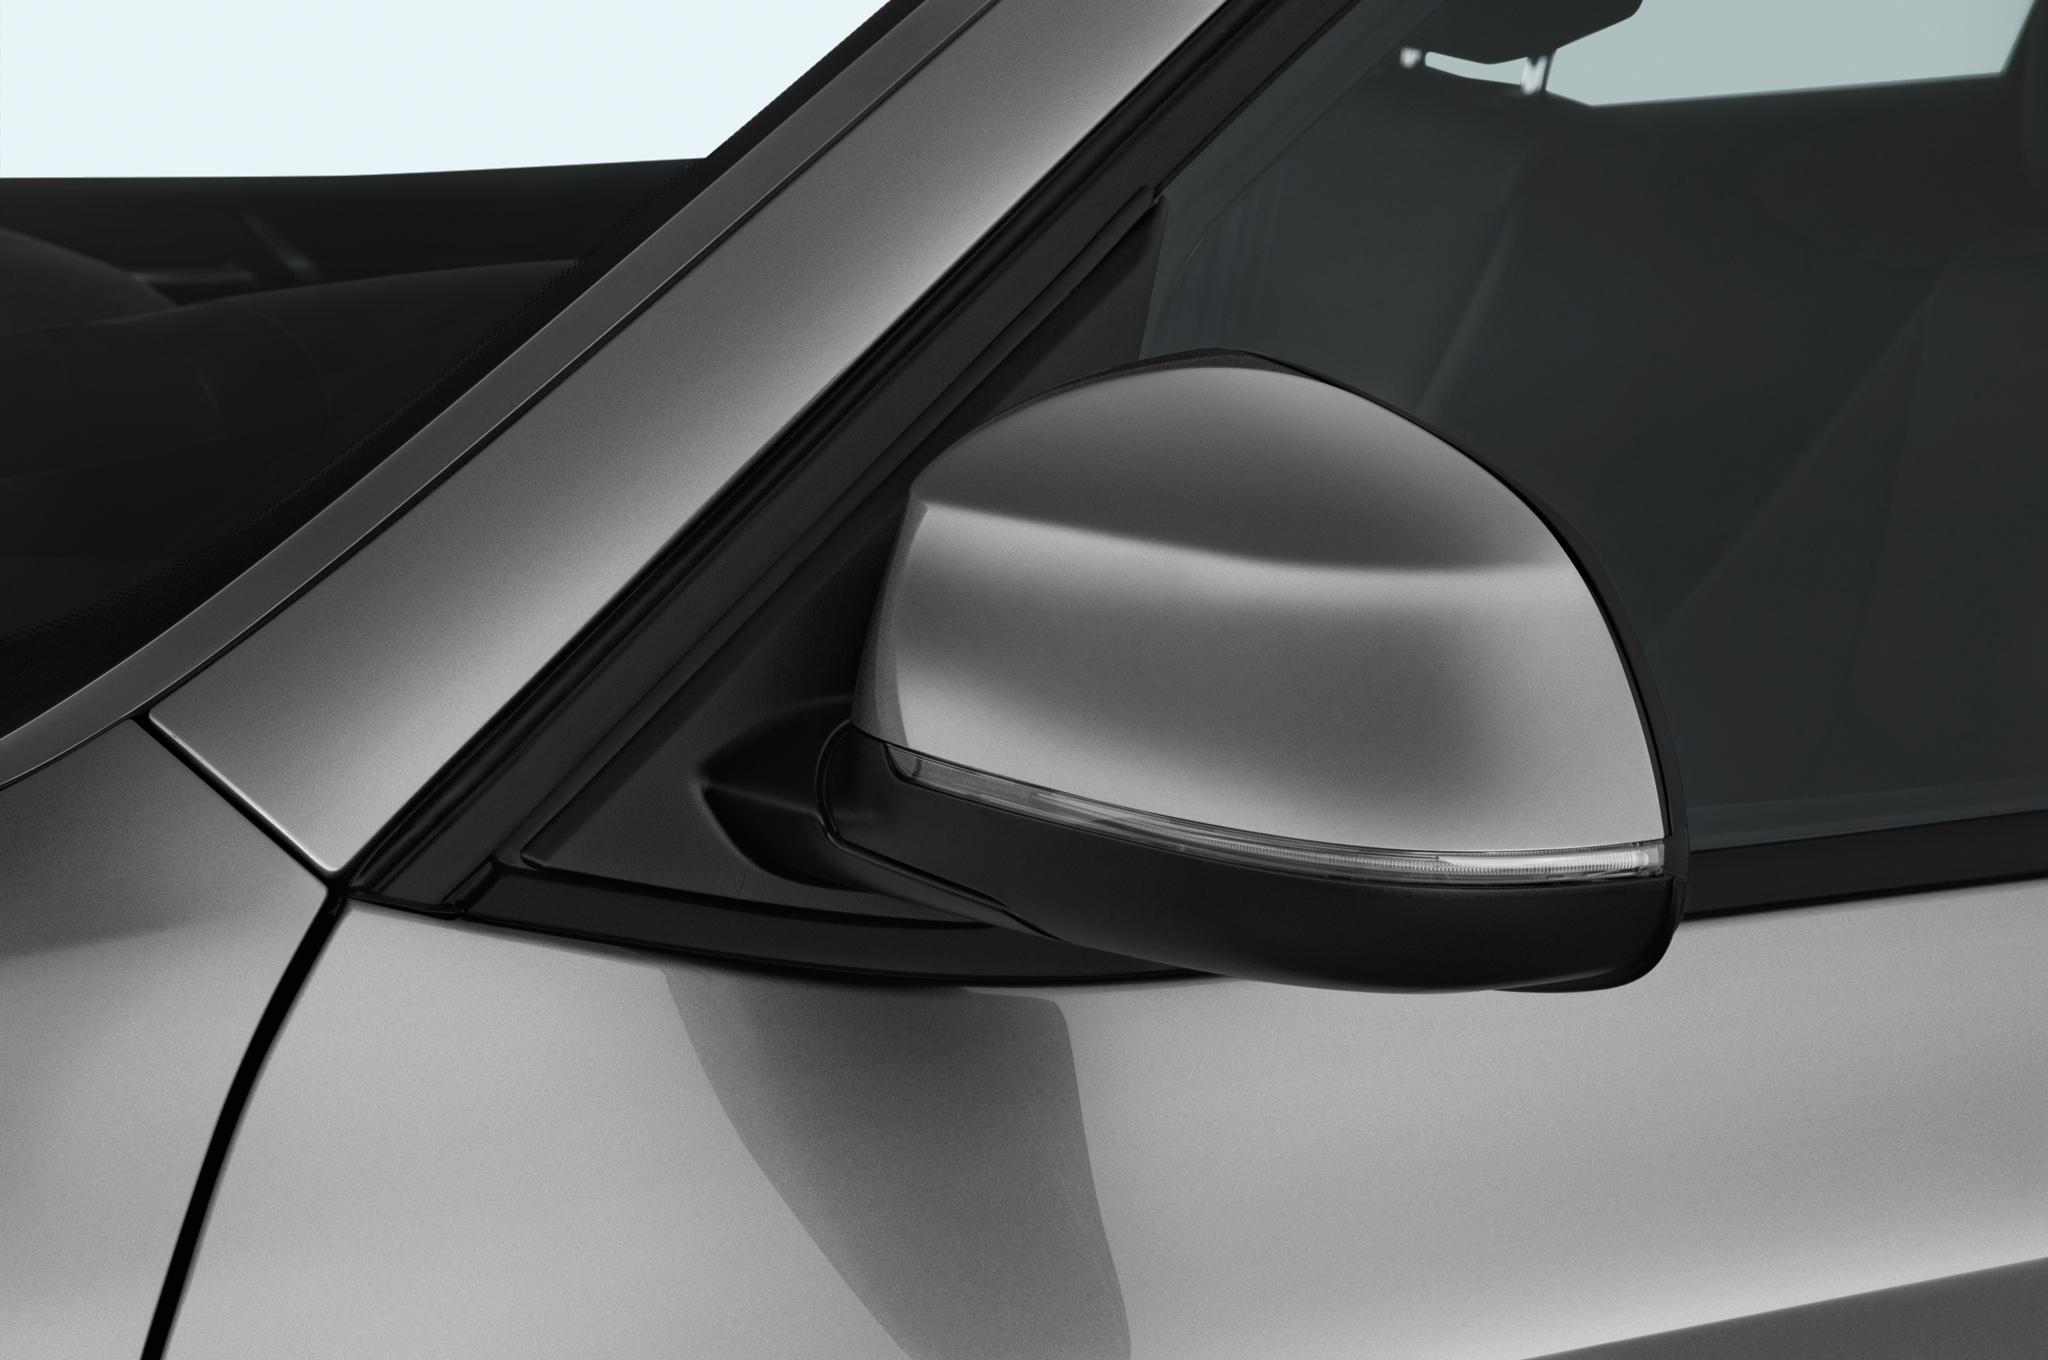 2015 Bmw X3 Xdrive28d Gets 34 Mpg Highway Automobile Magazine